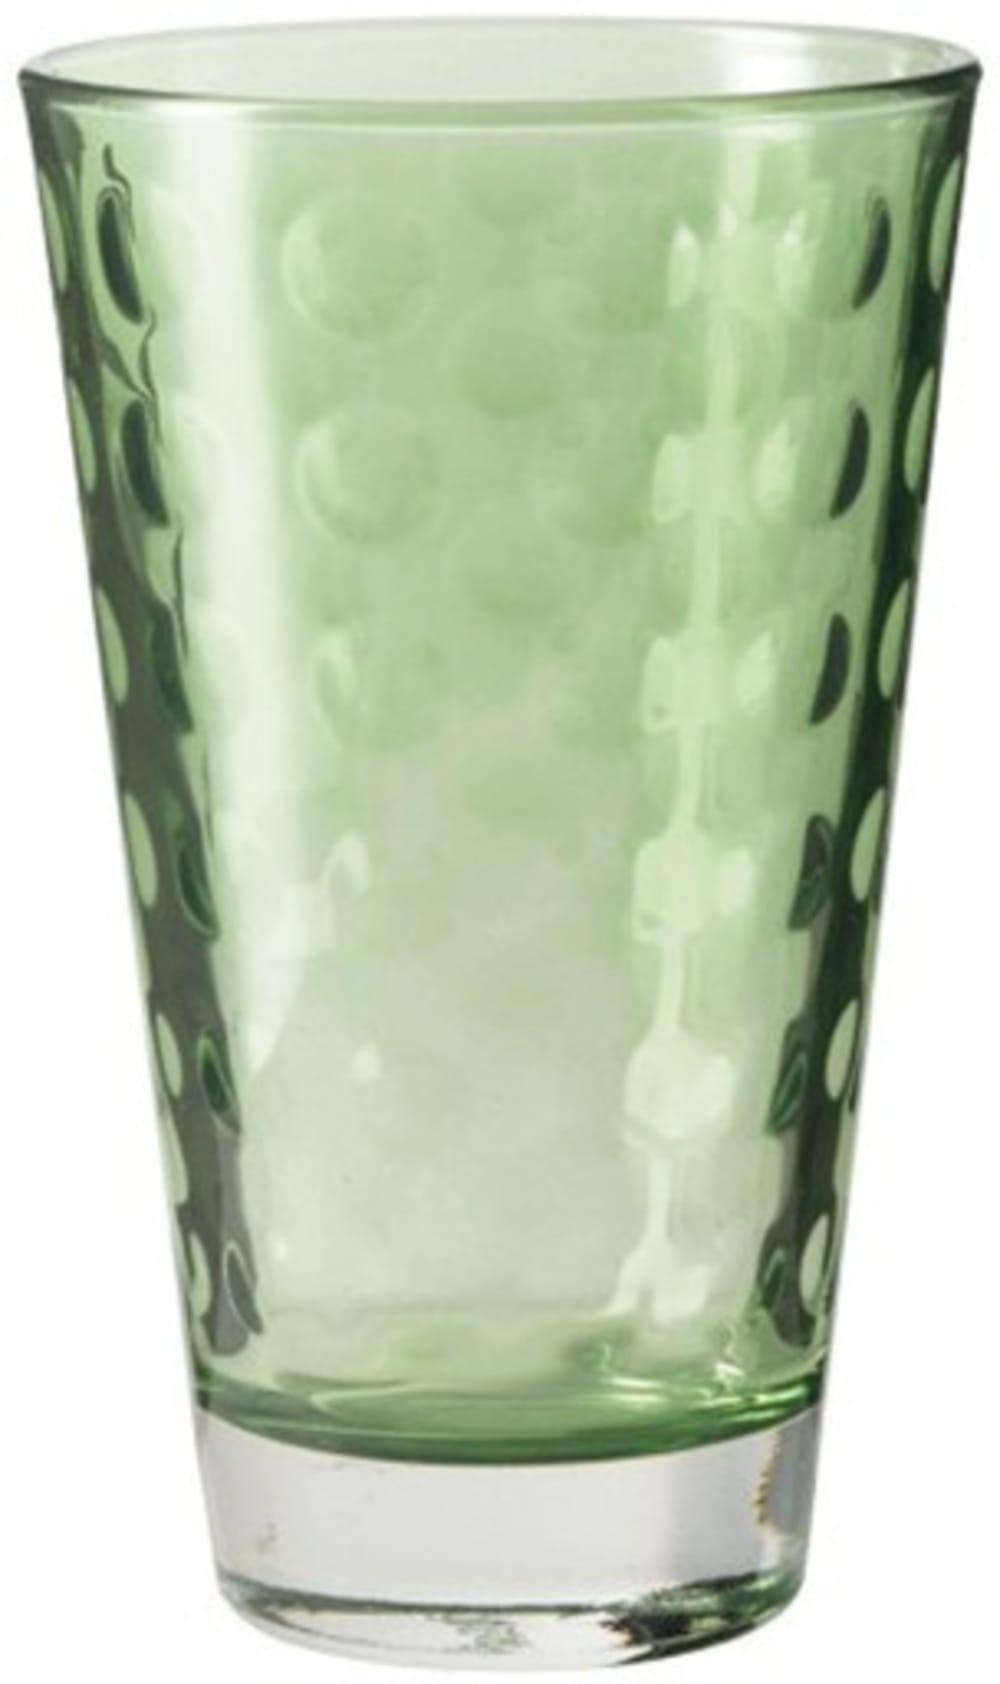 LO - Szklaneczka 300 ml, zielona, OPTIC